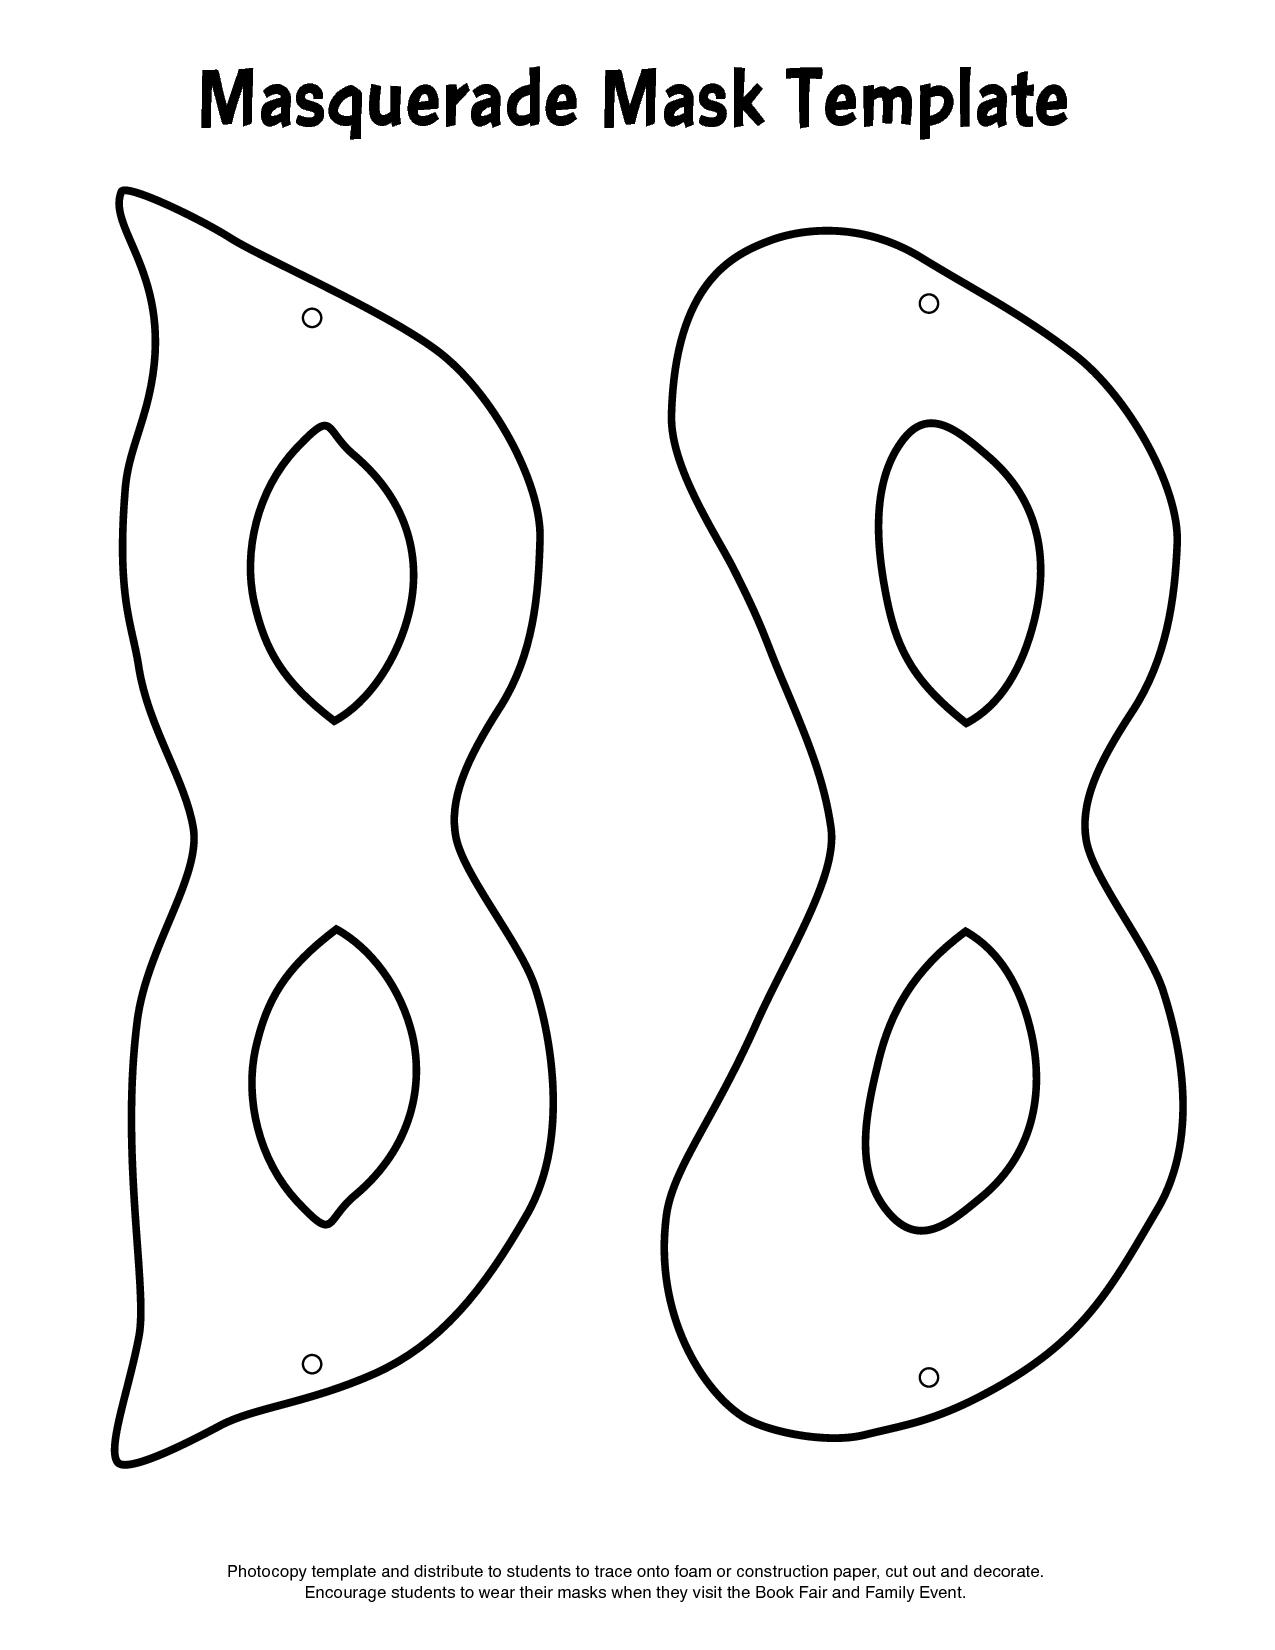 Free Printable Masquerade Masks - Babylon Yahoo! Search Results - Free Printable Masks